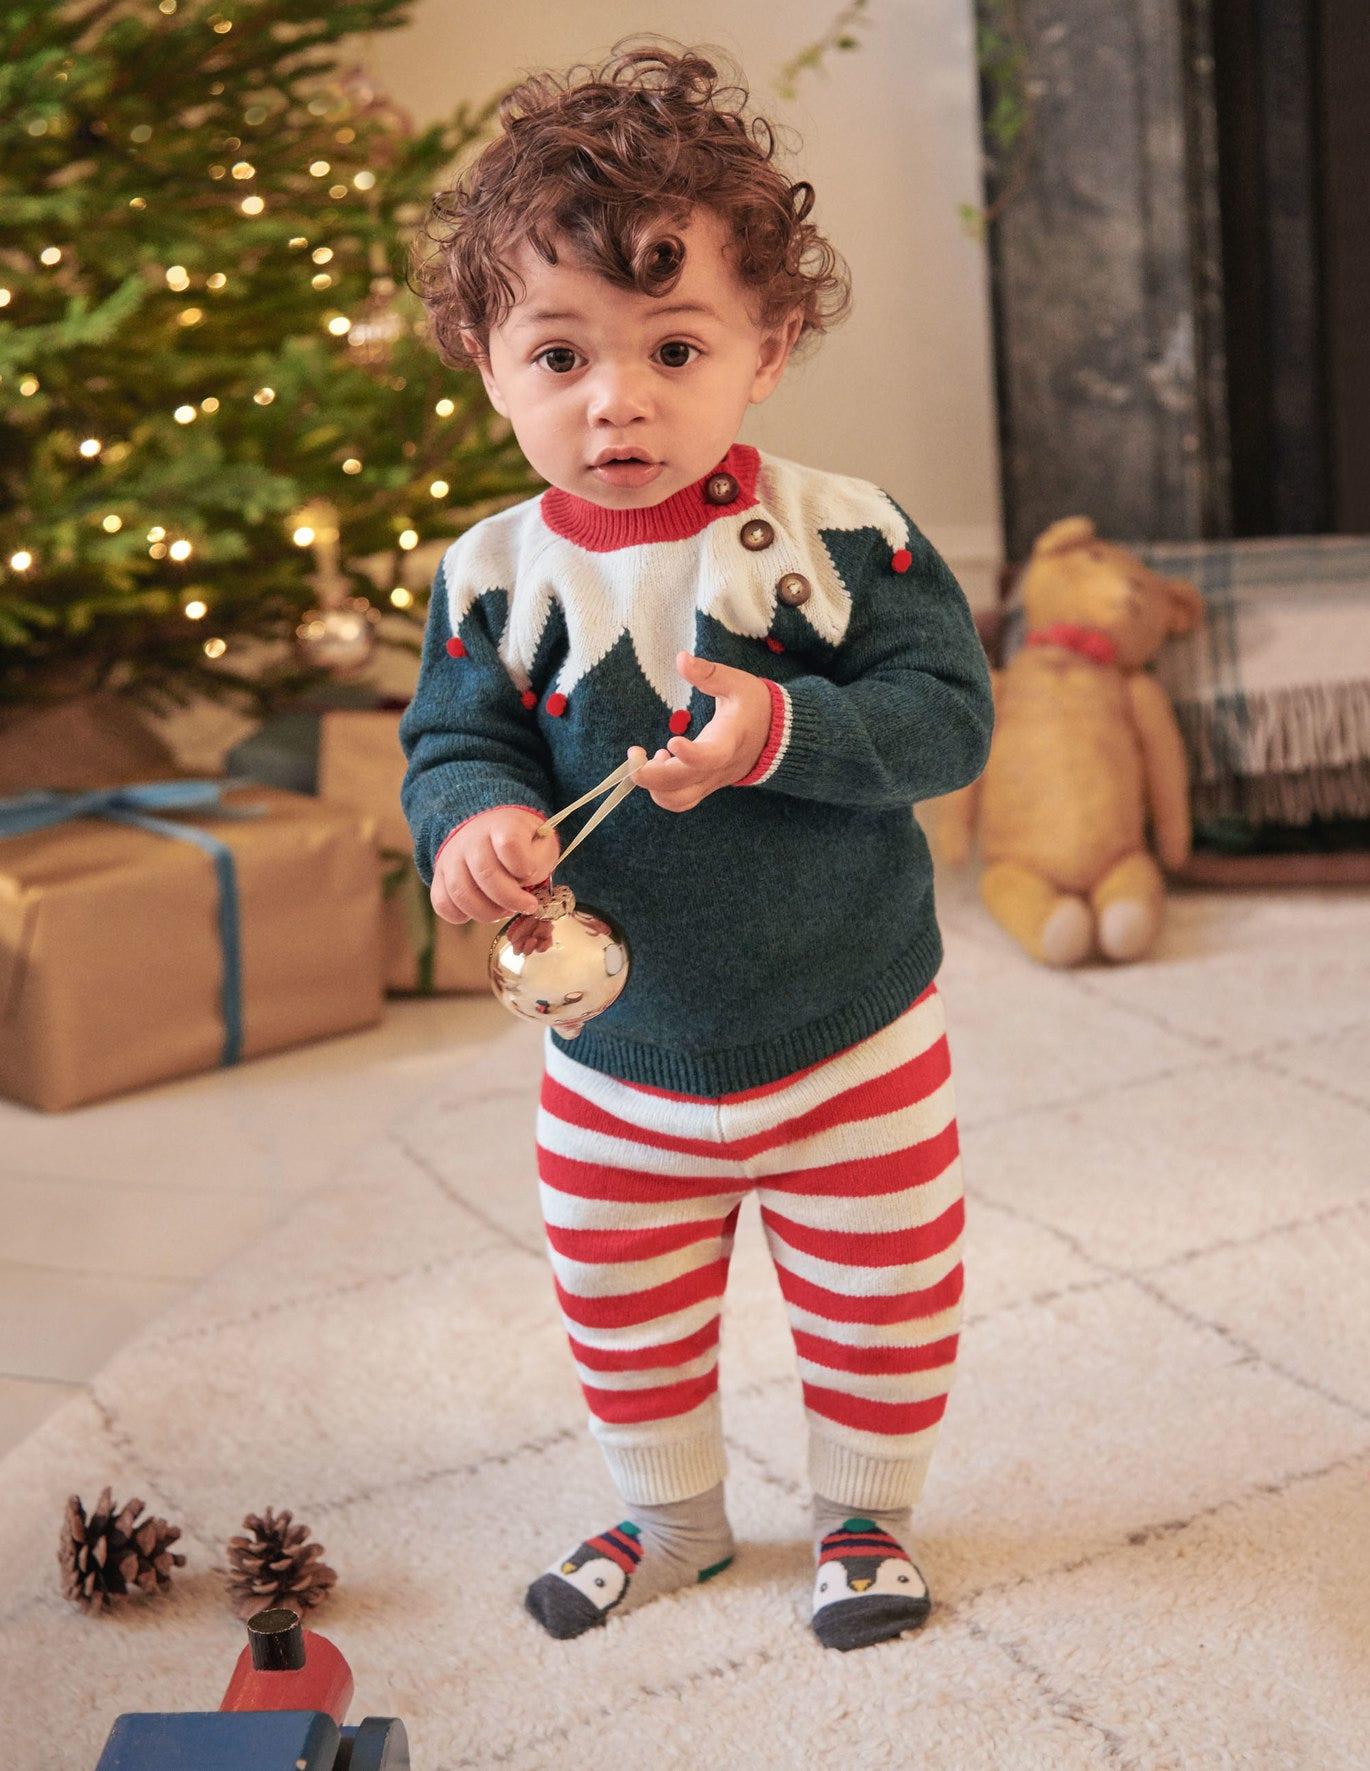 Novelty Knitted Play Set - Linden Green Elf